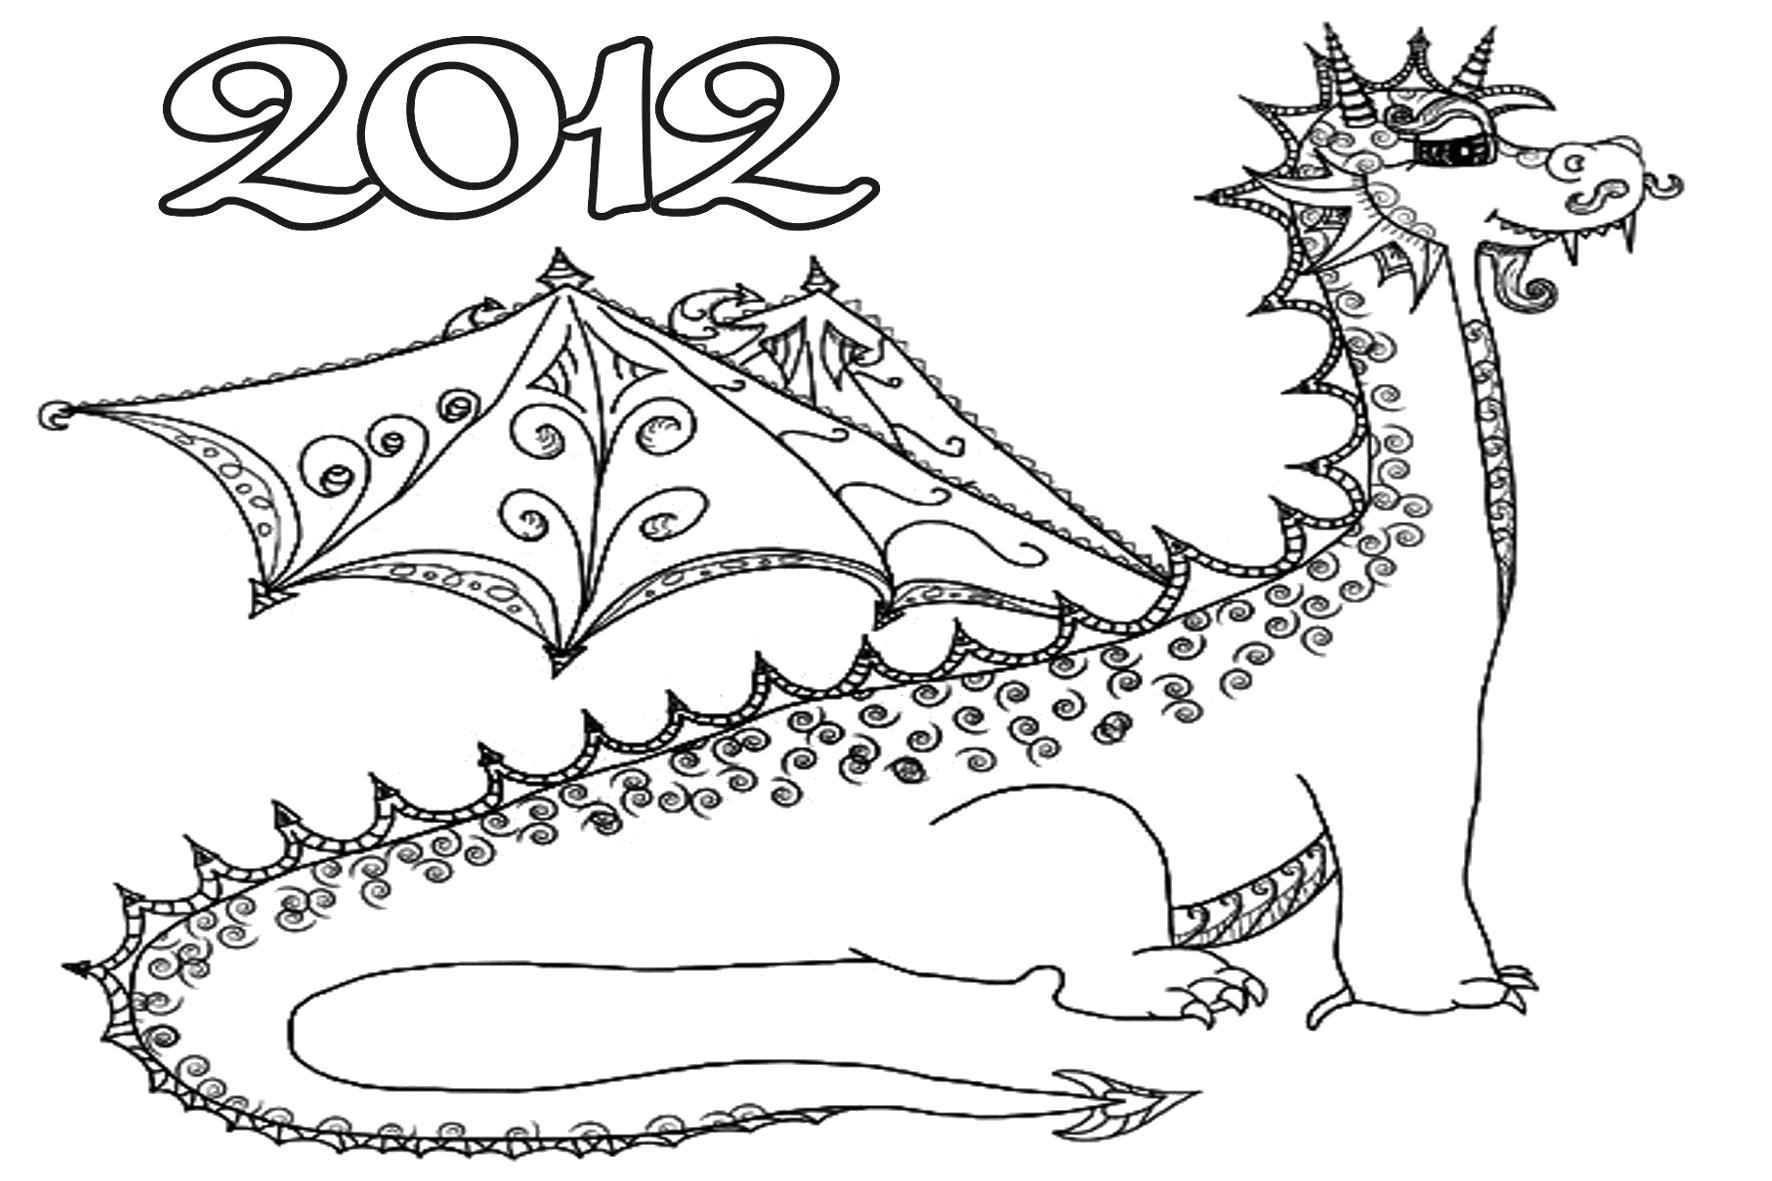 Раскраска раскраска дракон 2012. мифические существа